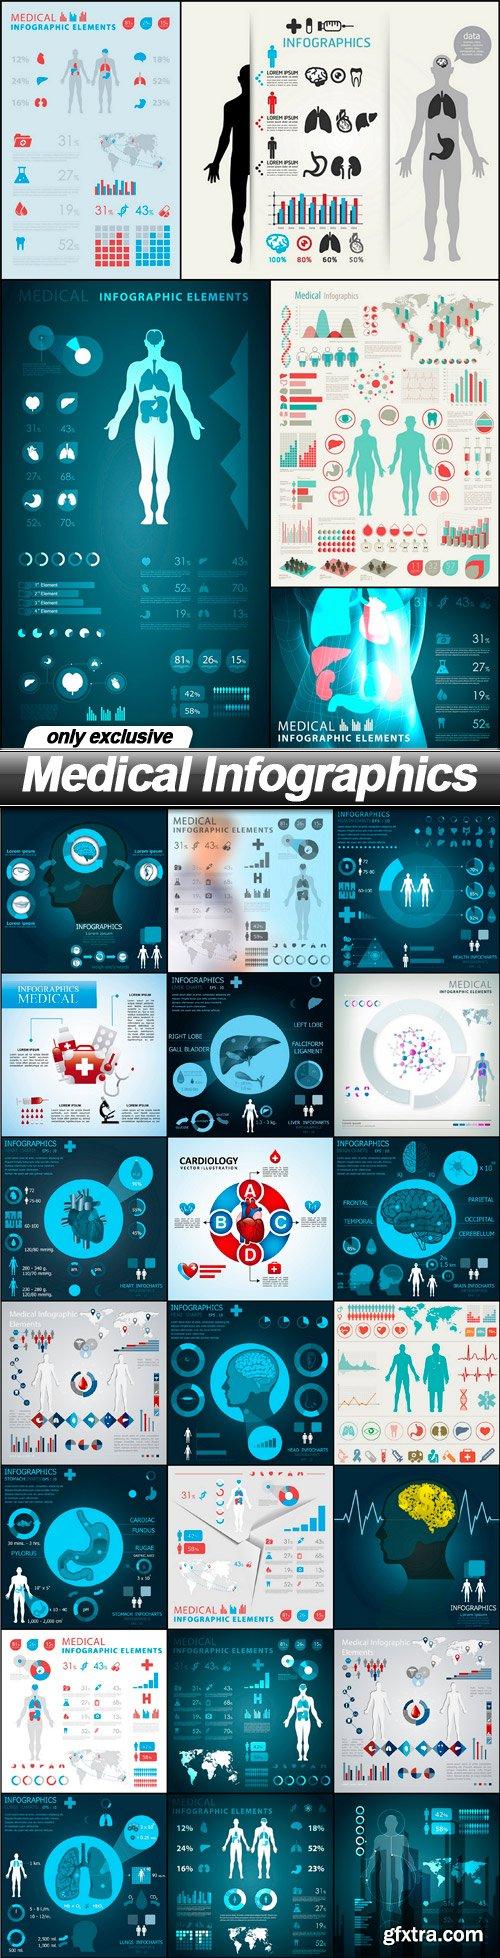 Medical Infographics - 25 EPS